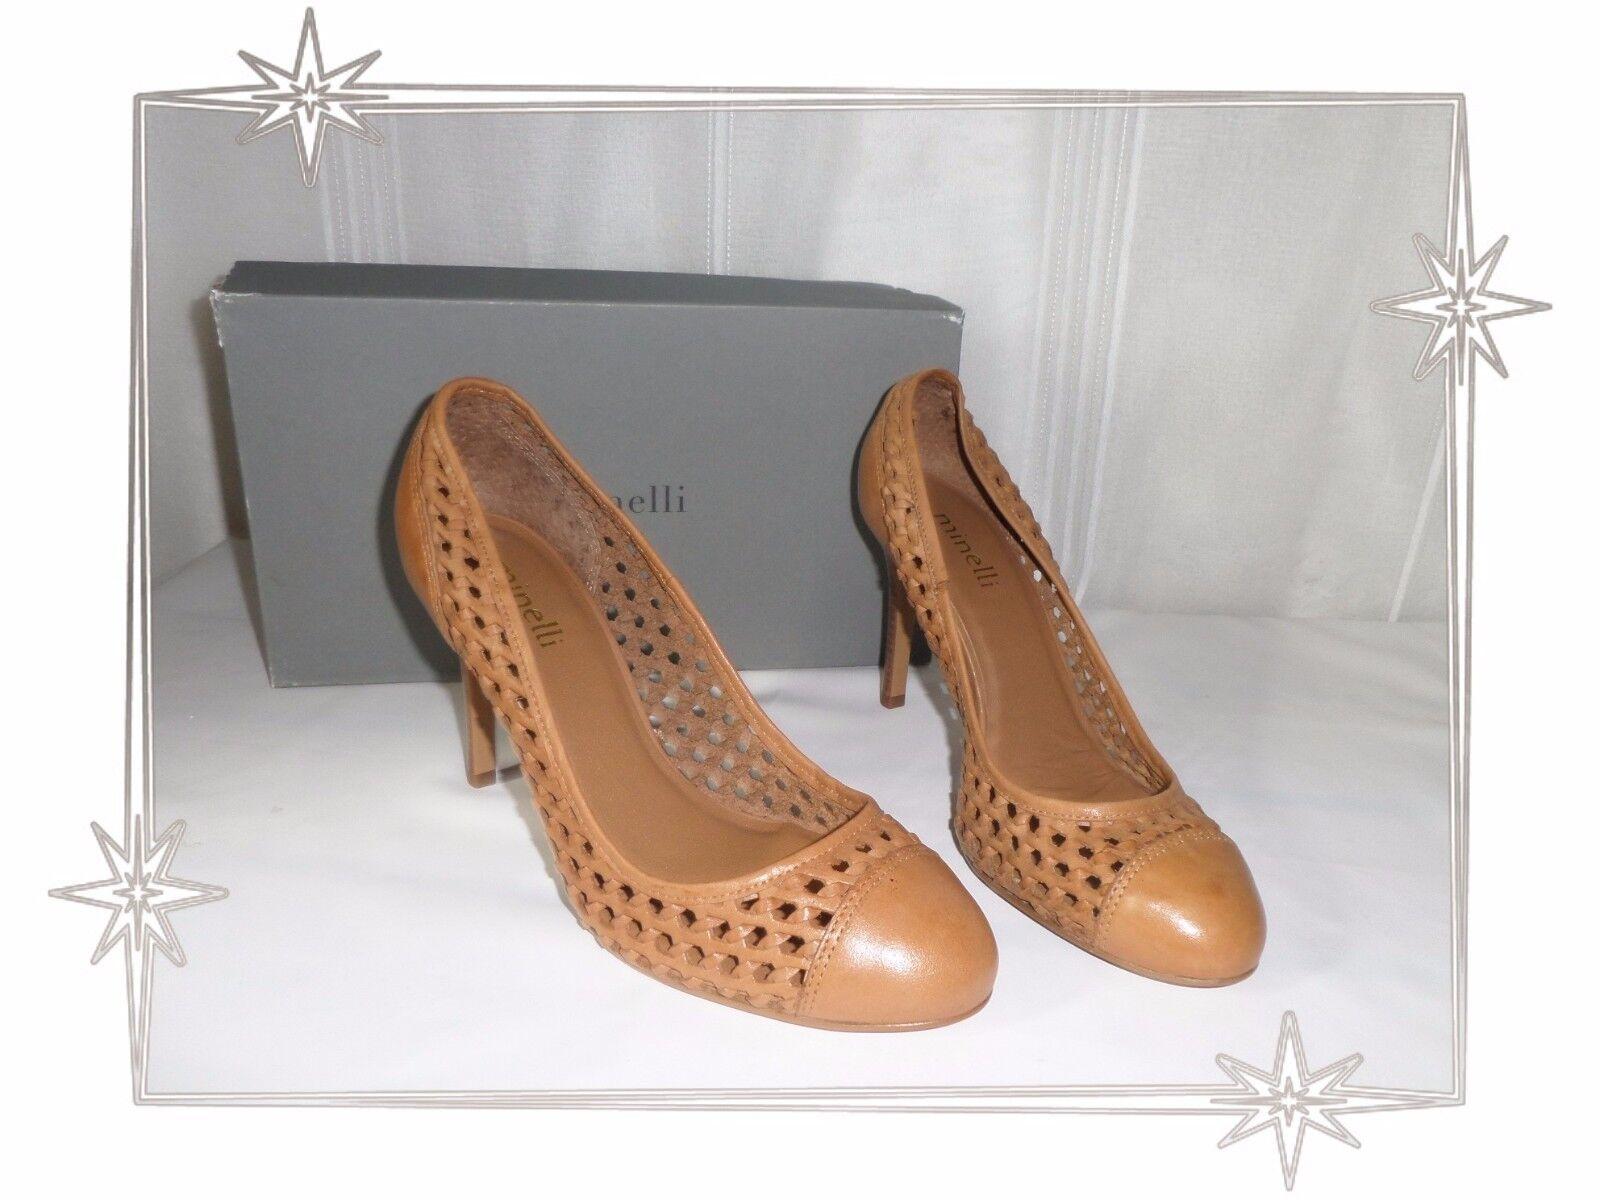 D-marrón zapatos pumps open minelli zapatos Talla 39 new